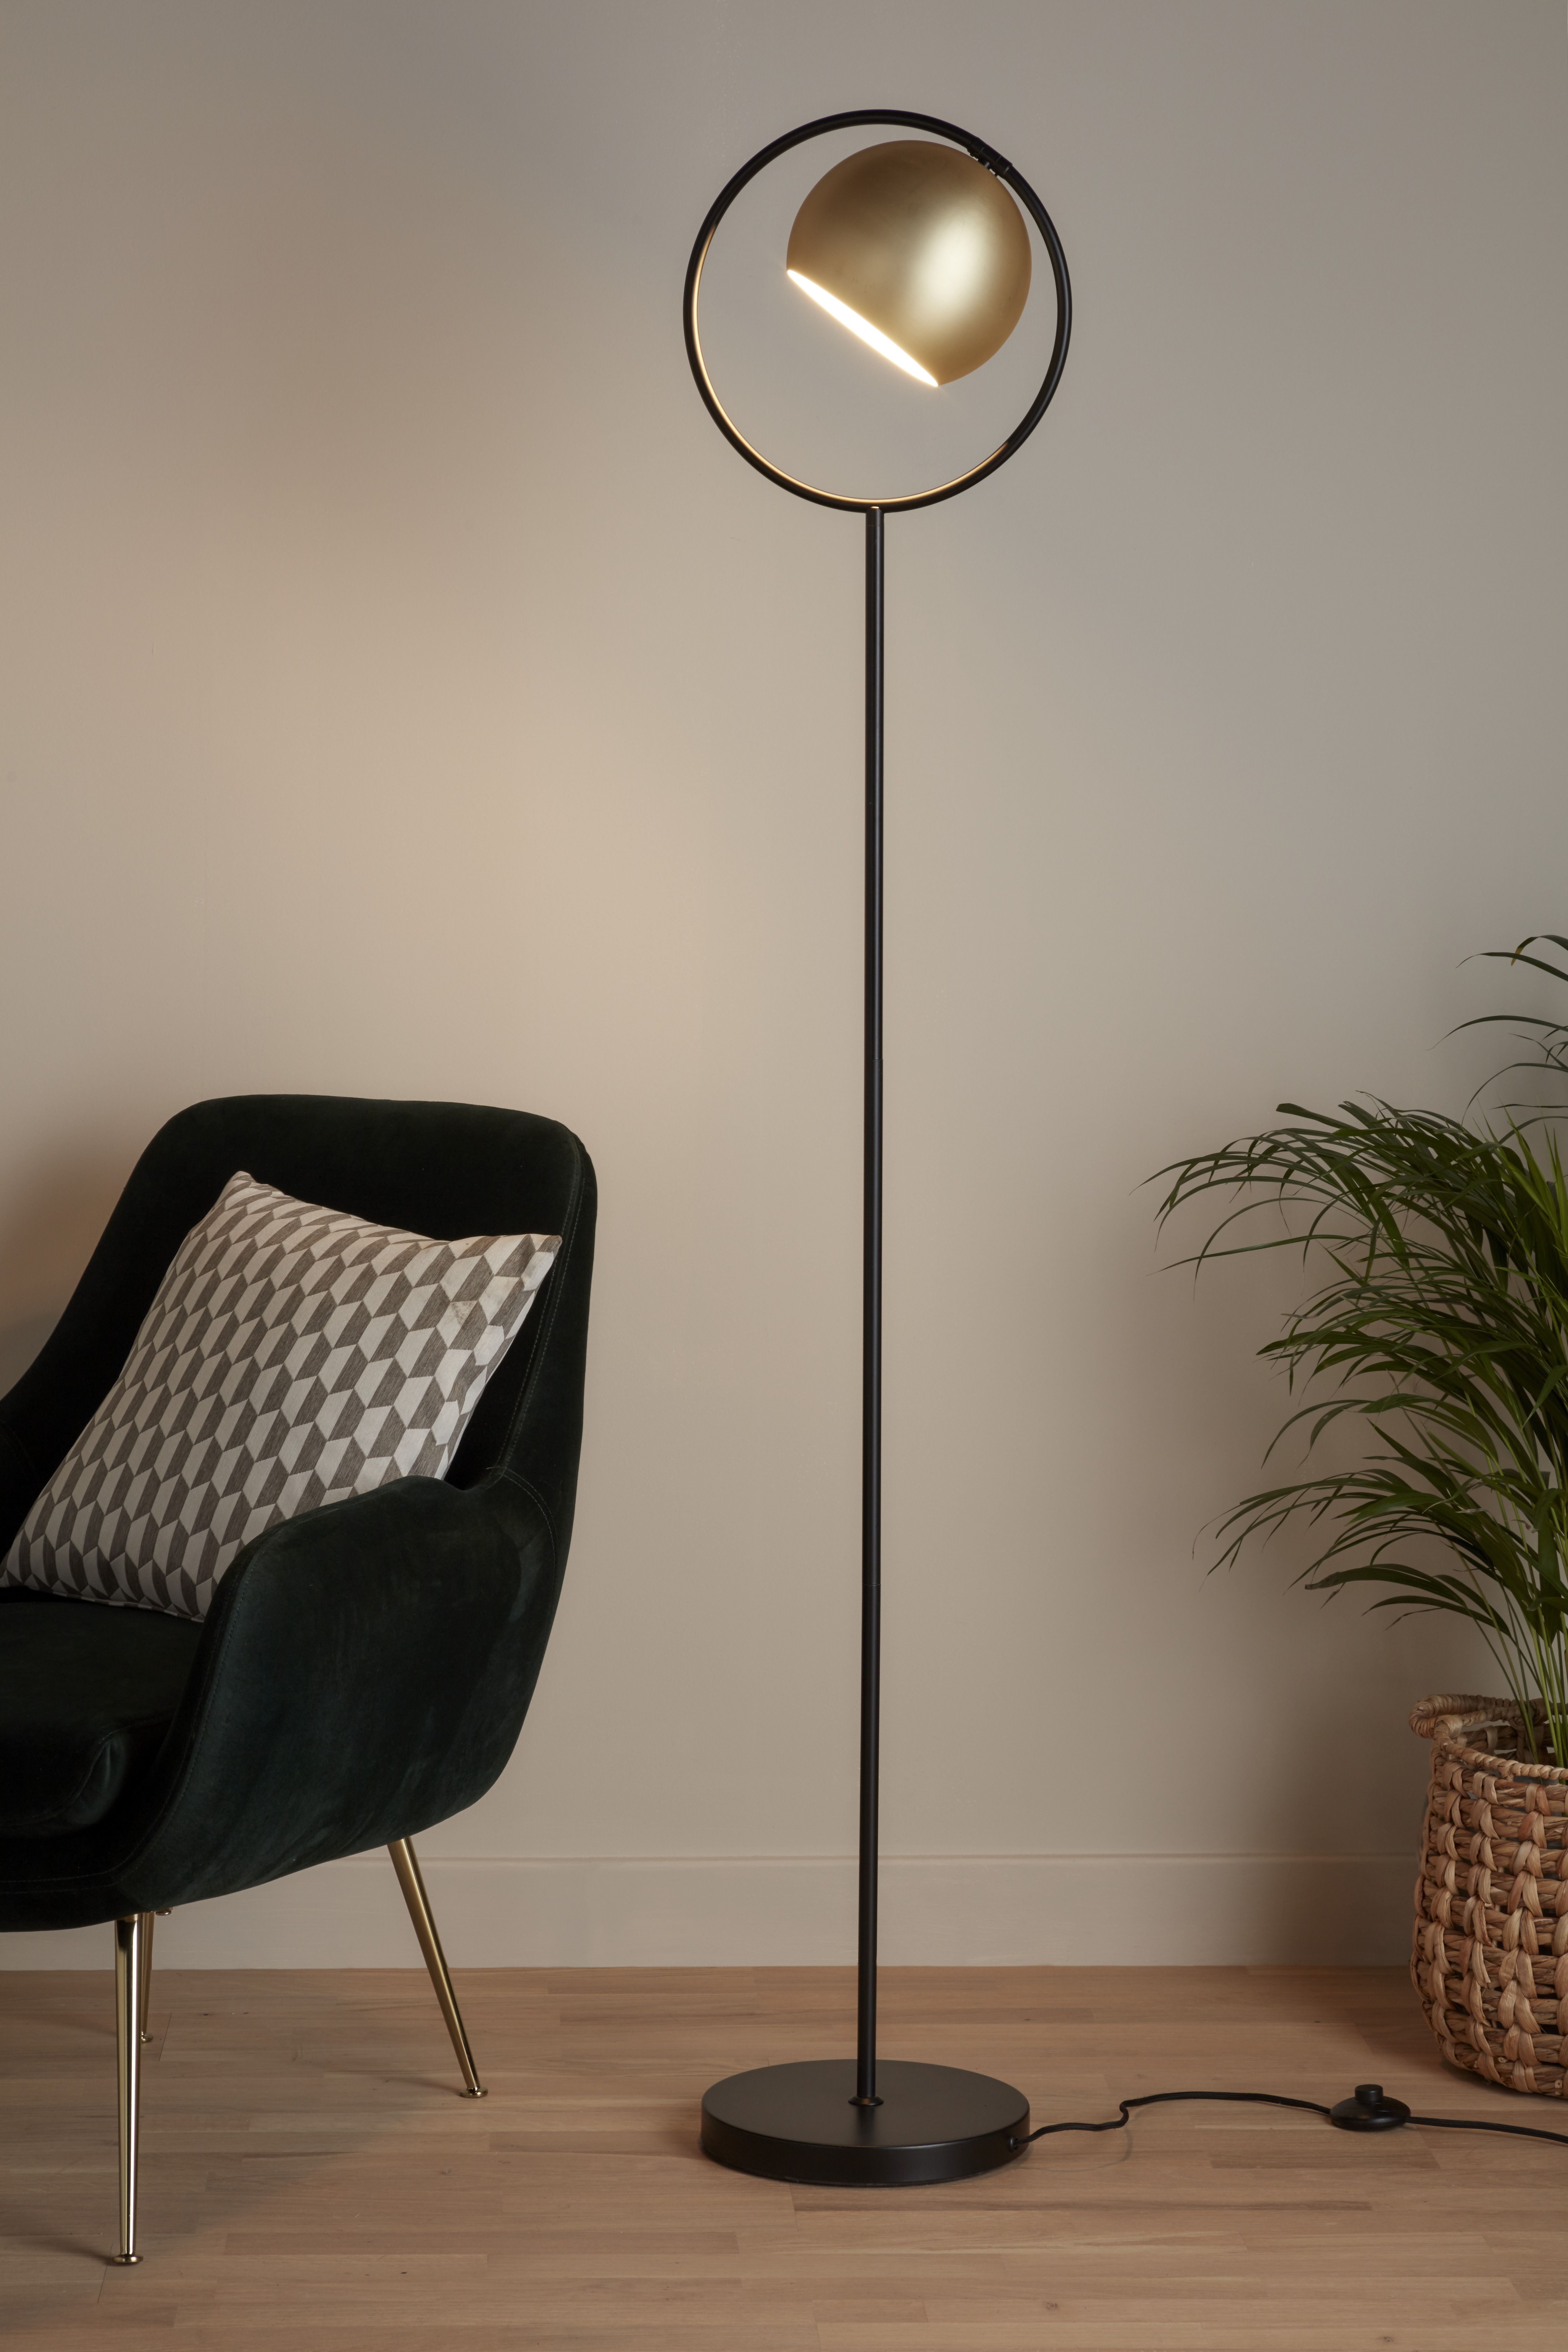 Lampa Podlogowa Goodhome Toroba 1 Punktowa E27 Czarna Zlota Lampy Podlogowe Decor Home Decor Home Appliances